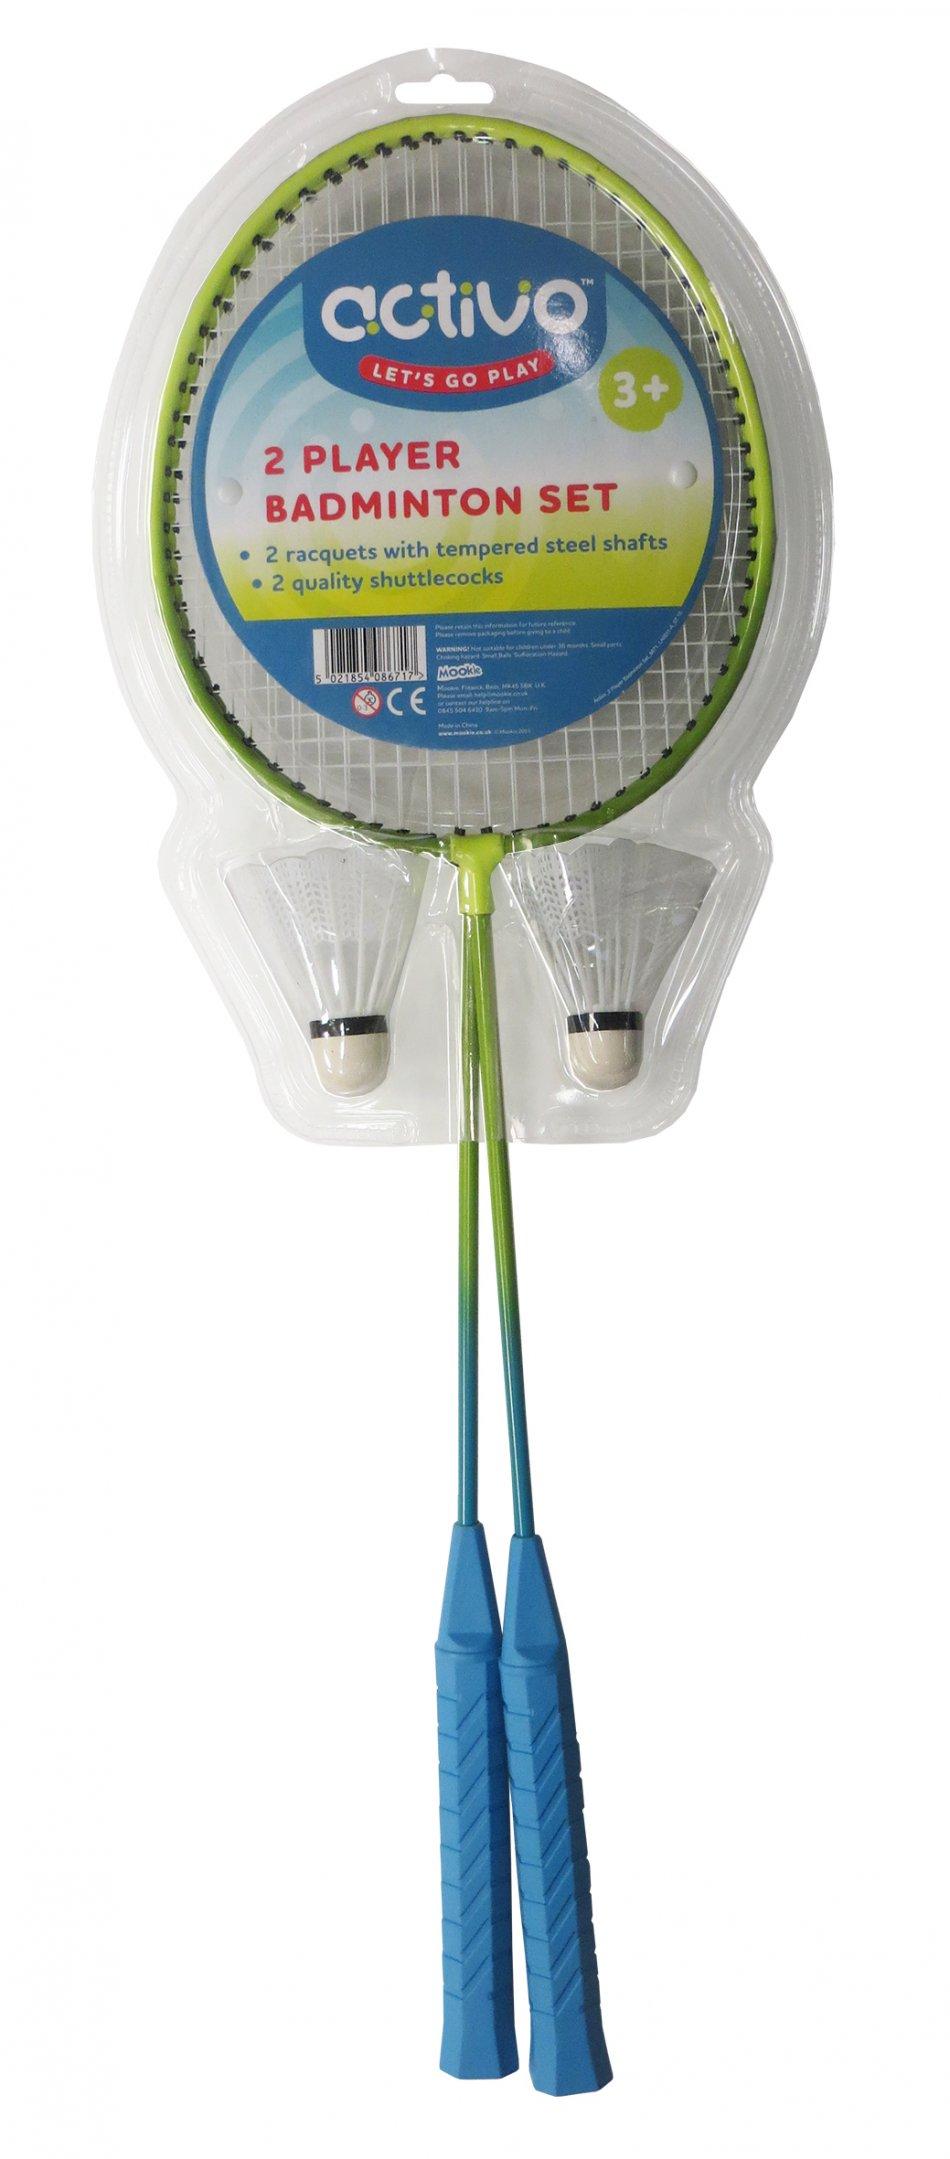 8671 2 Player Badminton Set